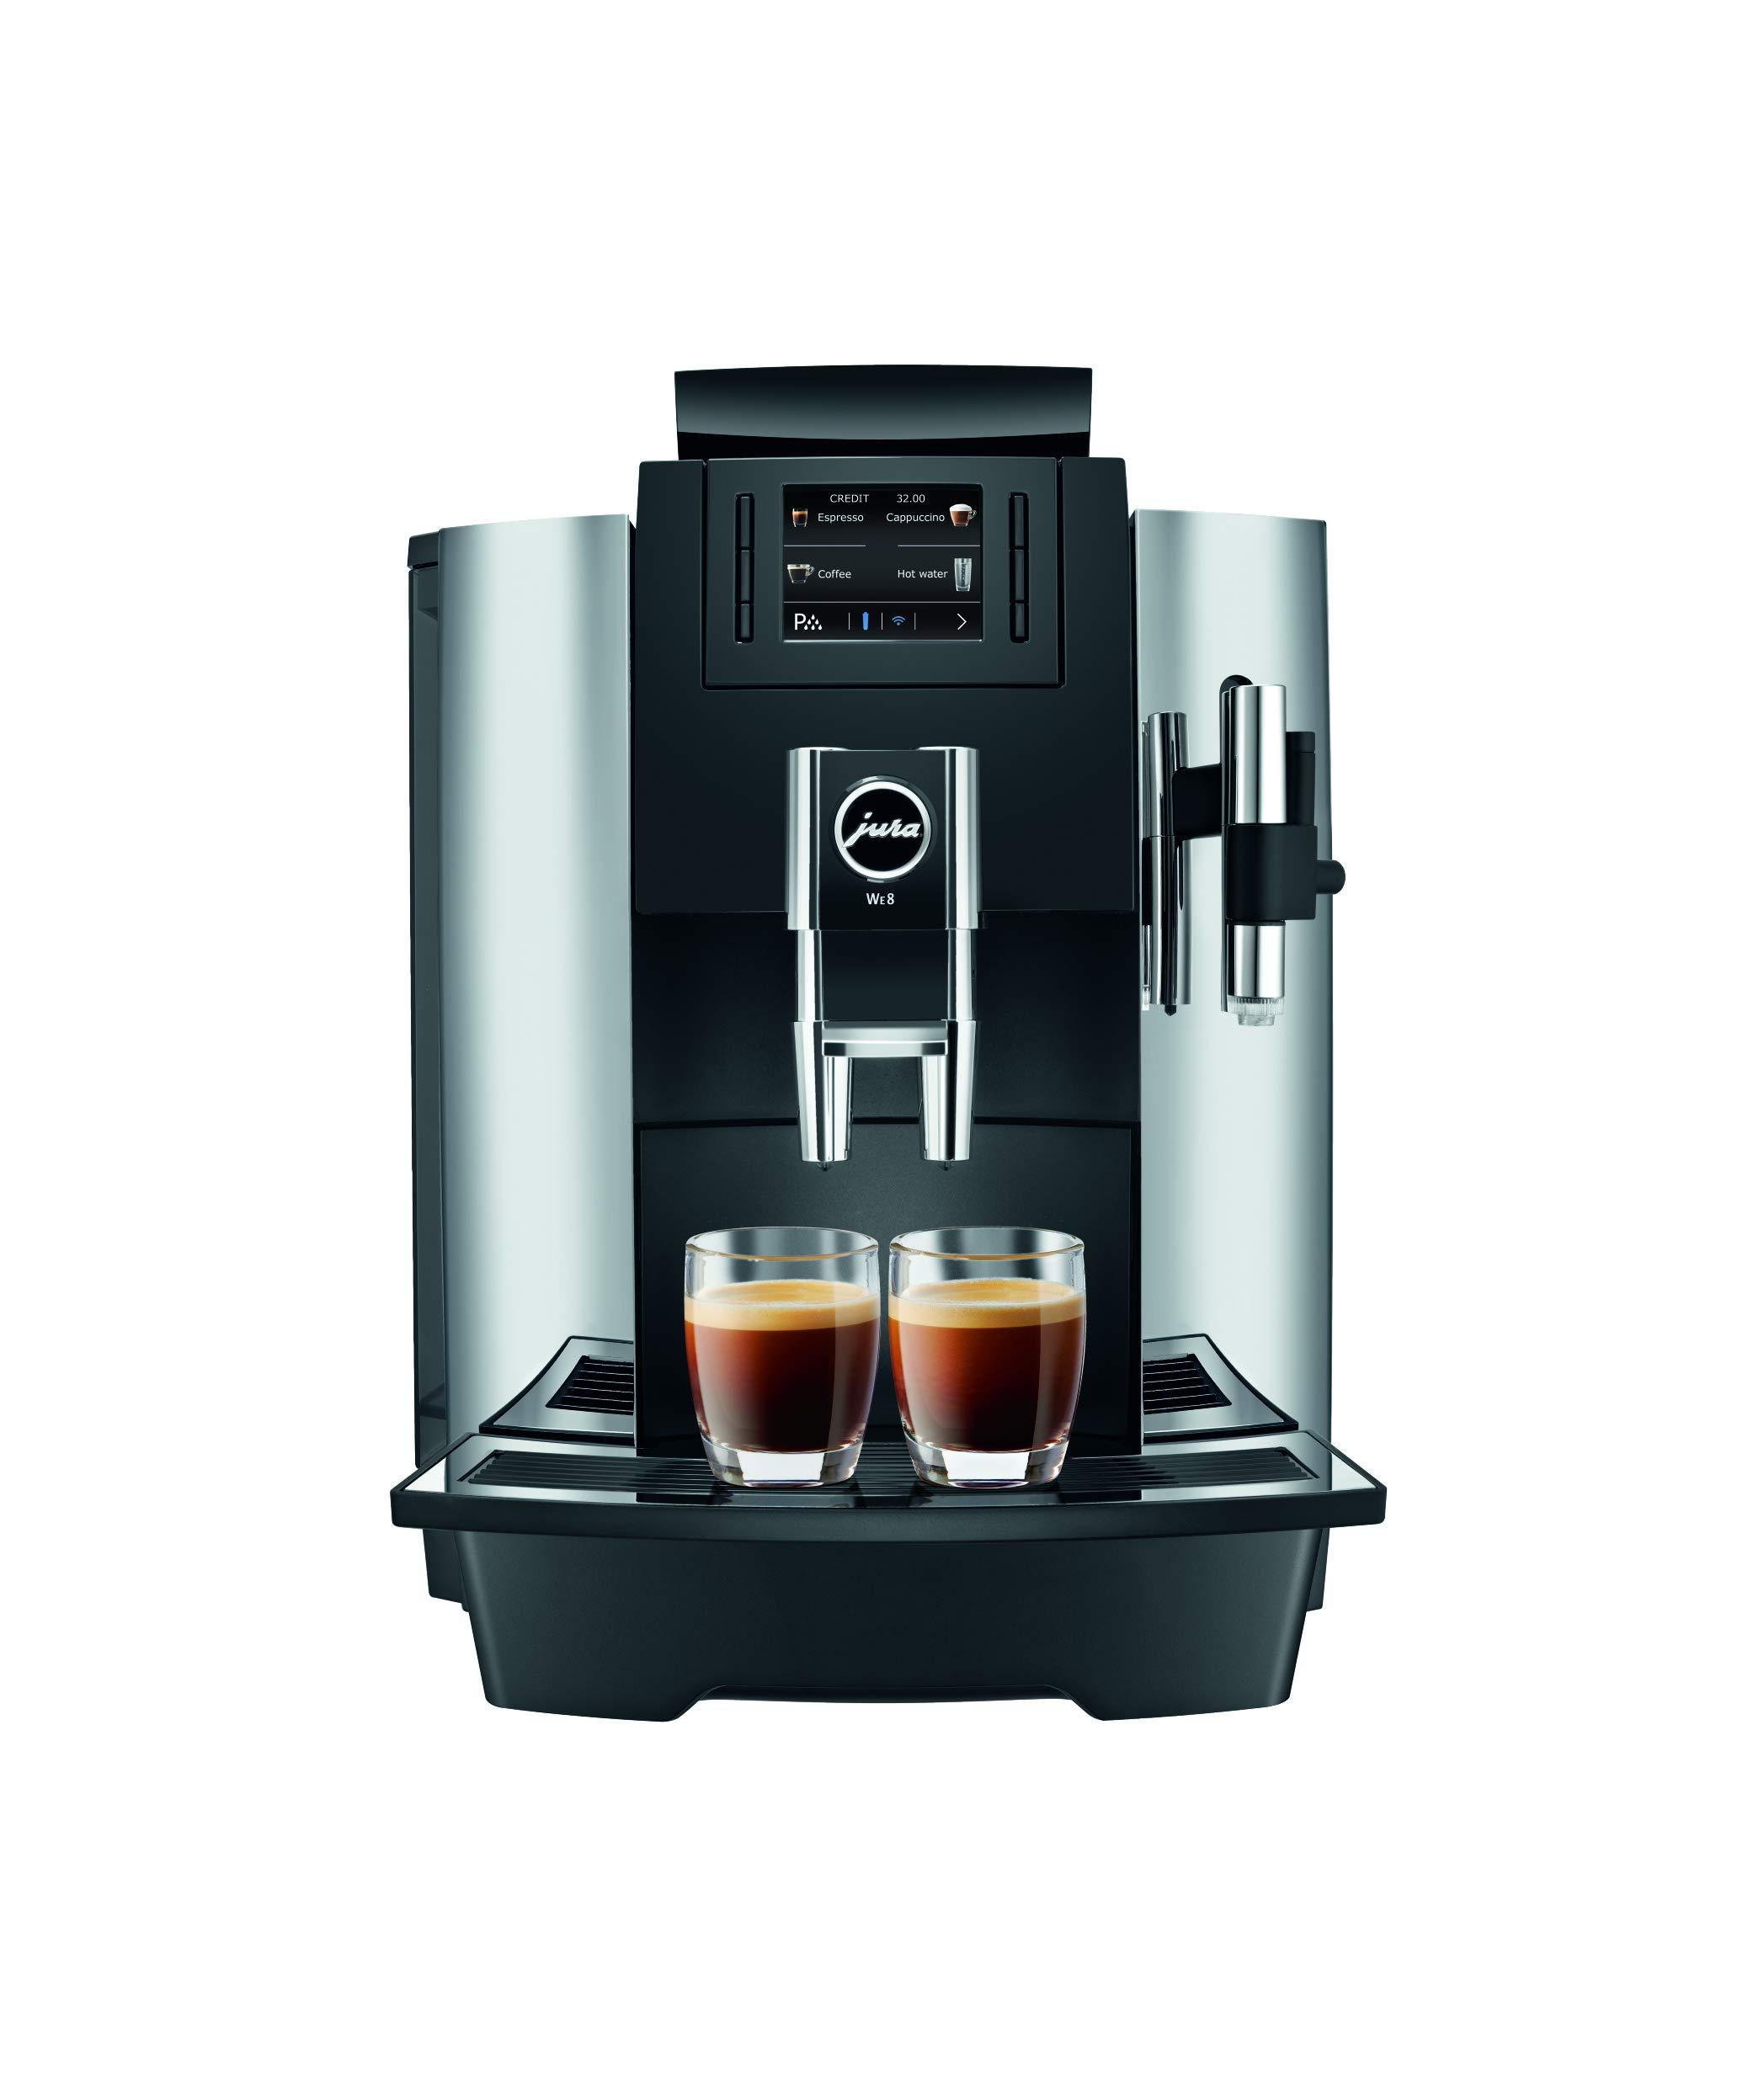 Jura 15145 Automatic Coffee Machine WE8, Chrome by Jura